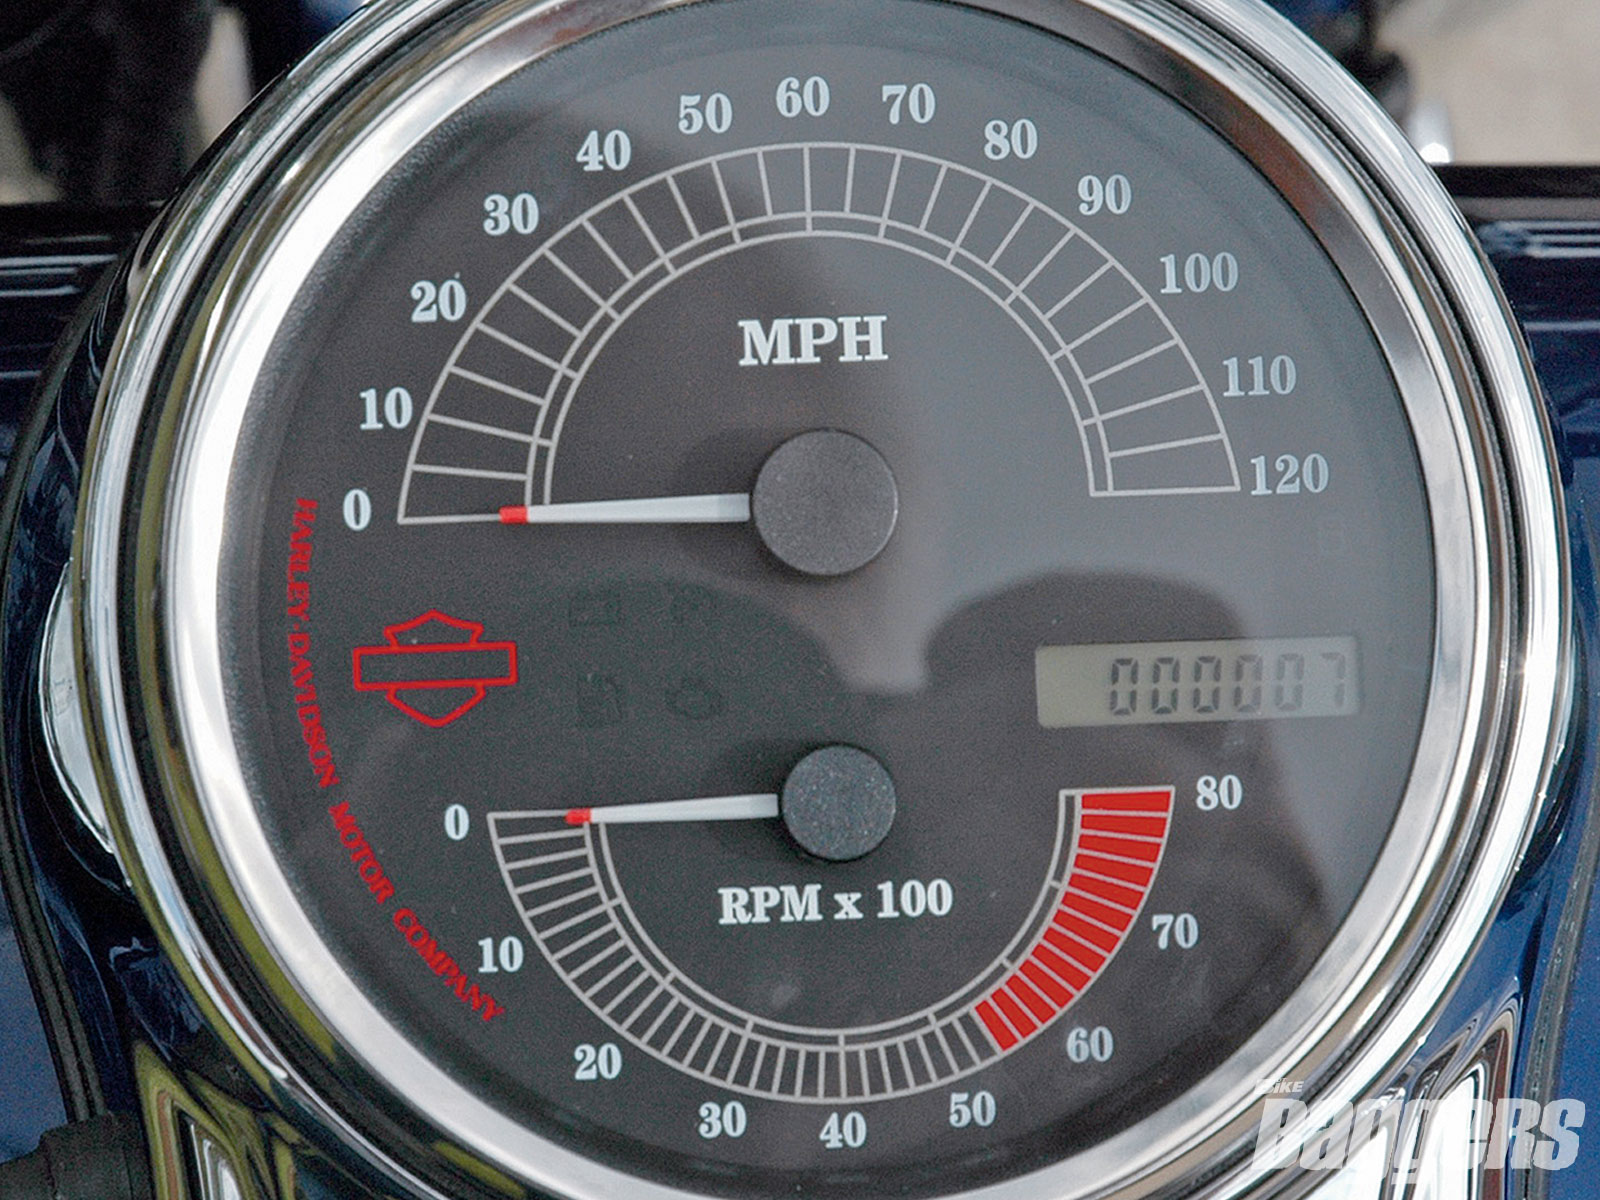 Snap Project Harley Davidson Tachometer Momex Photos On Pinterest Mini Tach Wiring Diagram Ridenrollgarage Marcha Lenta Mitos E Lendas